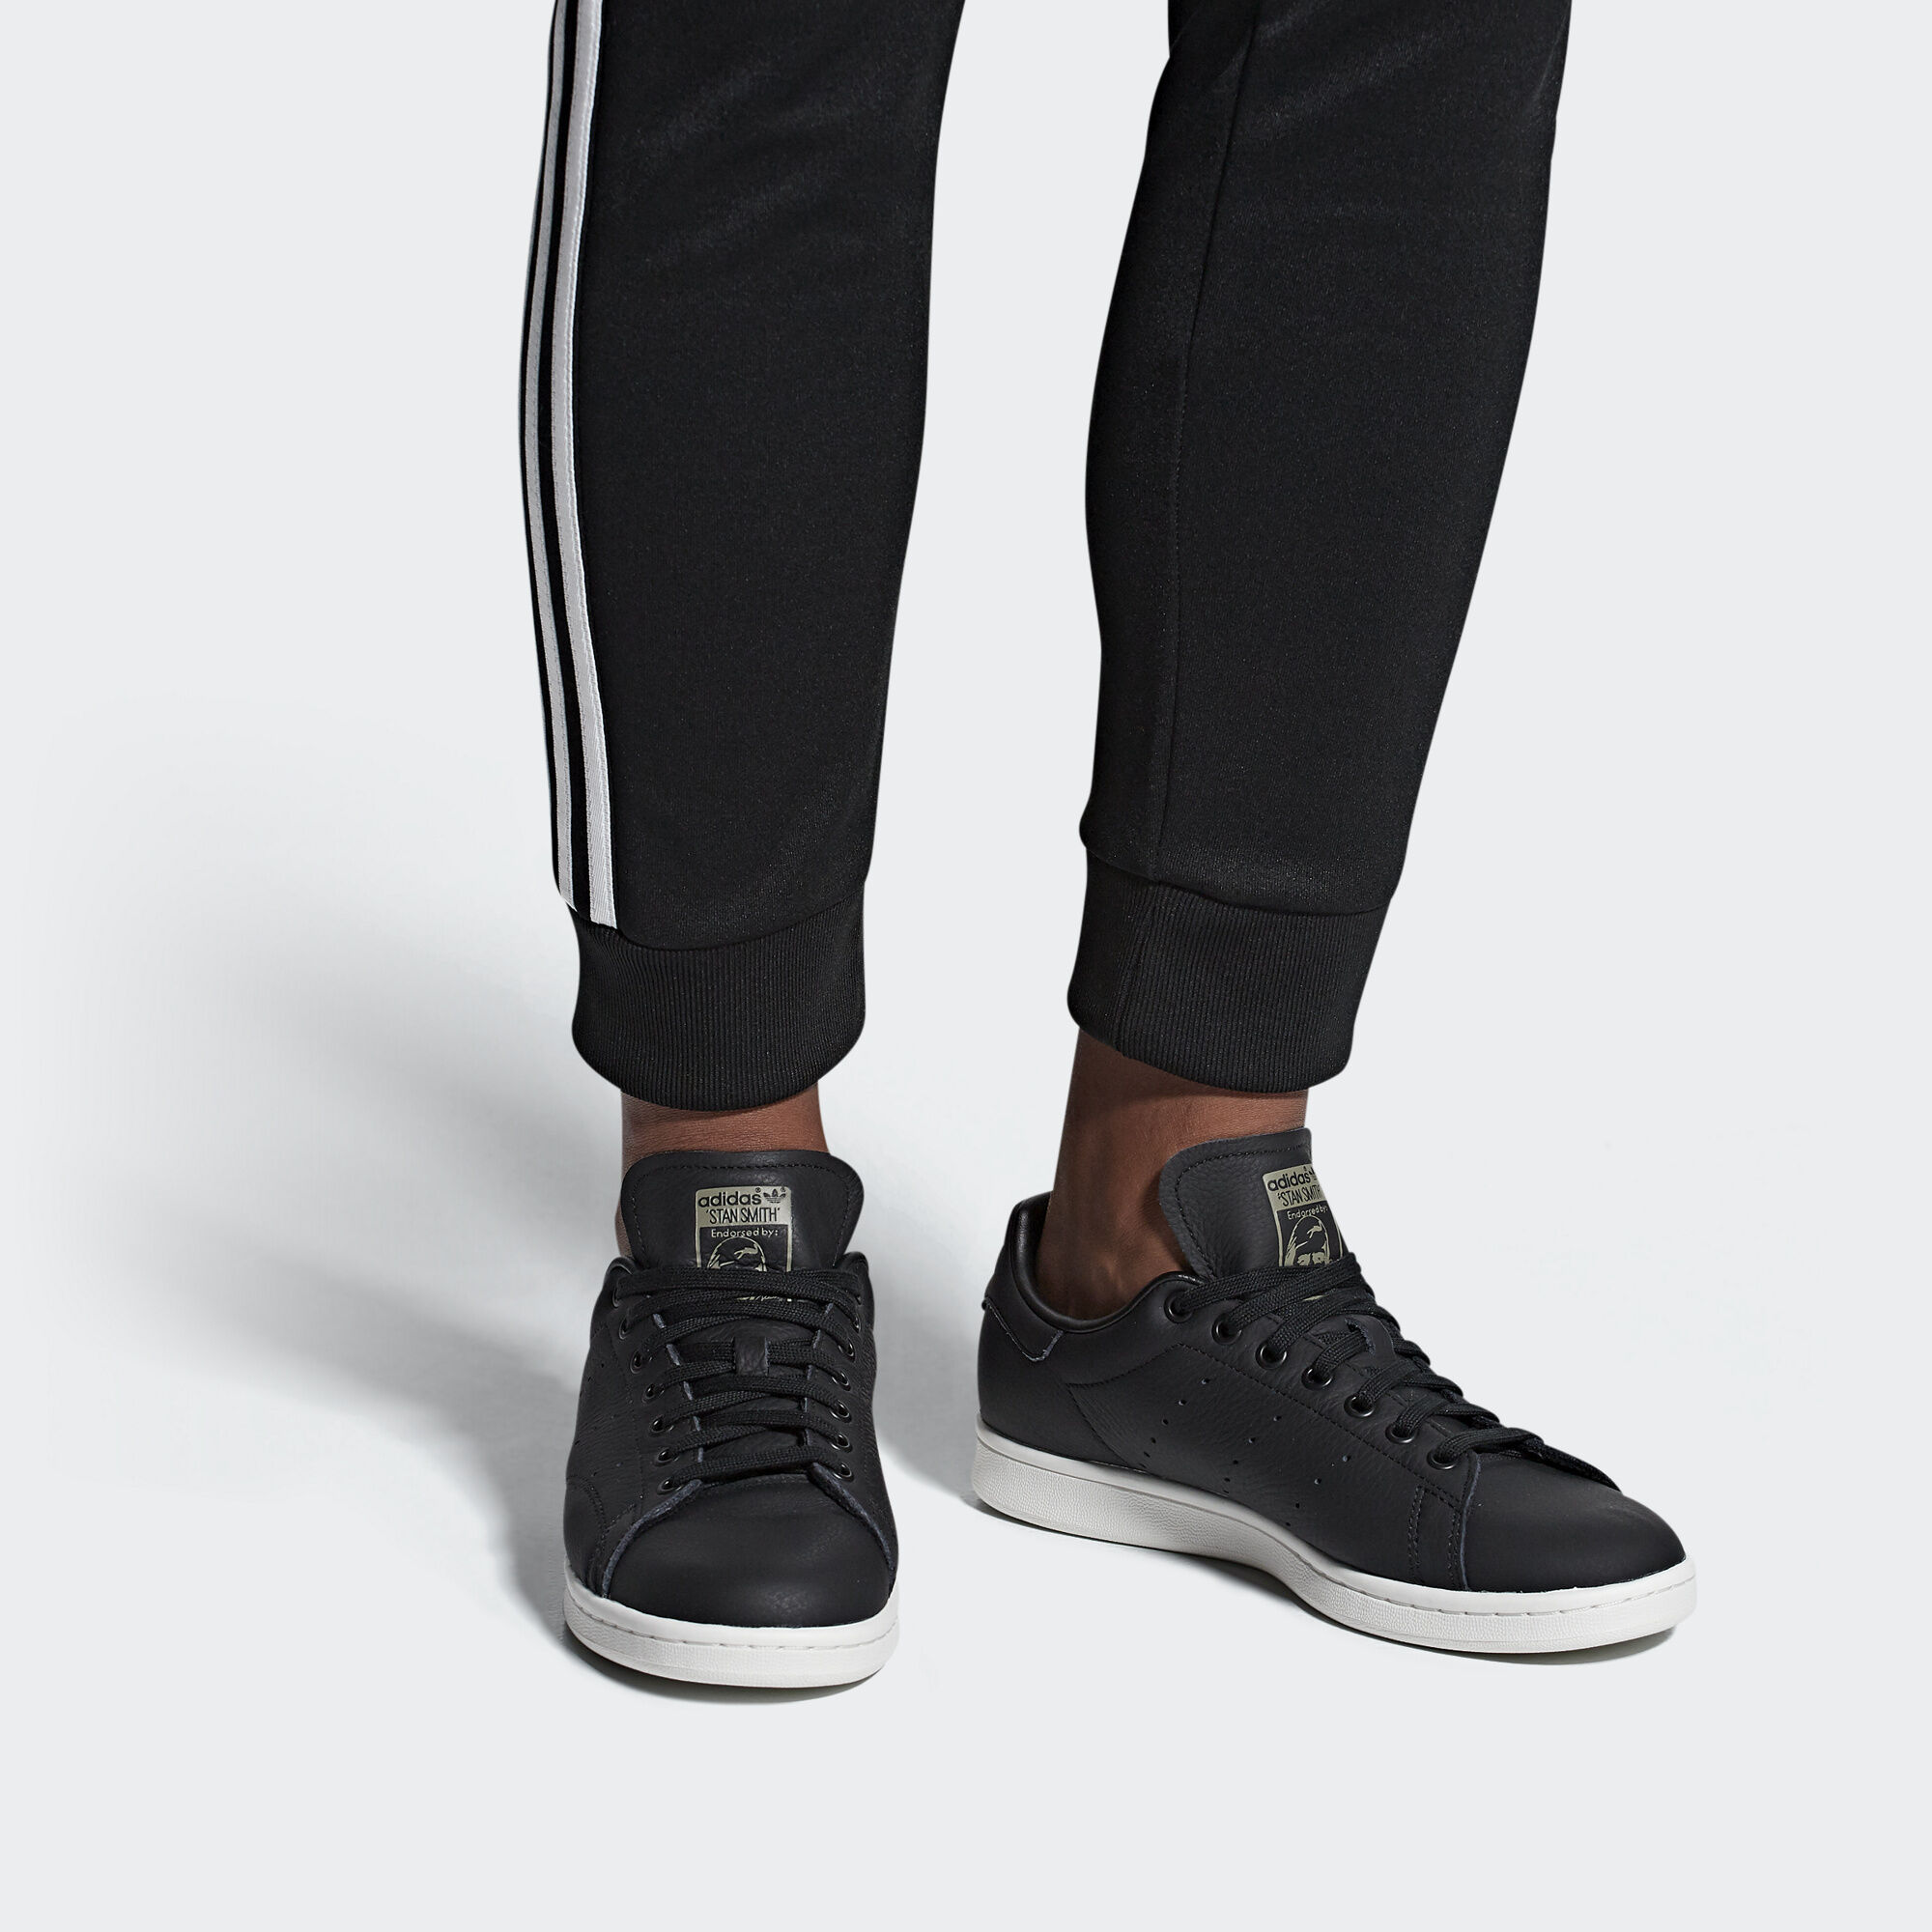 b383594825c535 adidas Stan Smith Shoes - Black